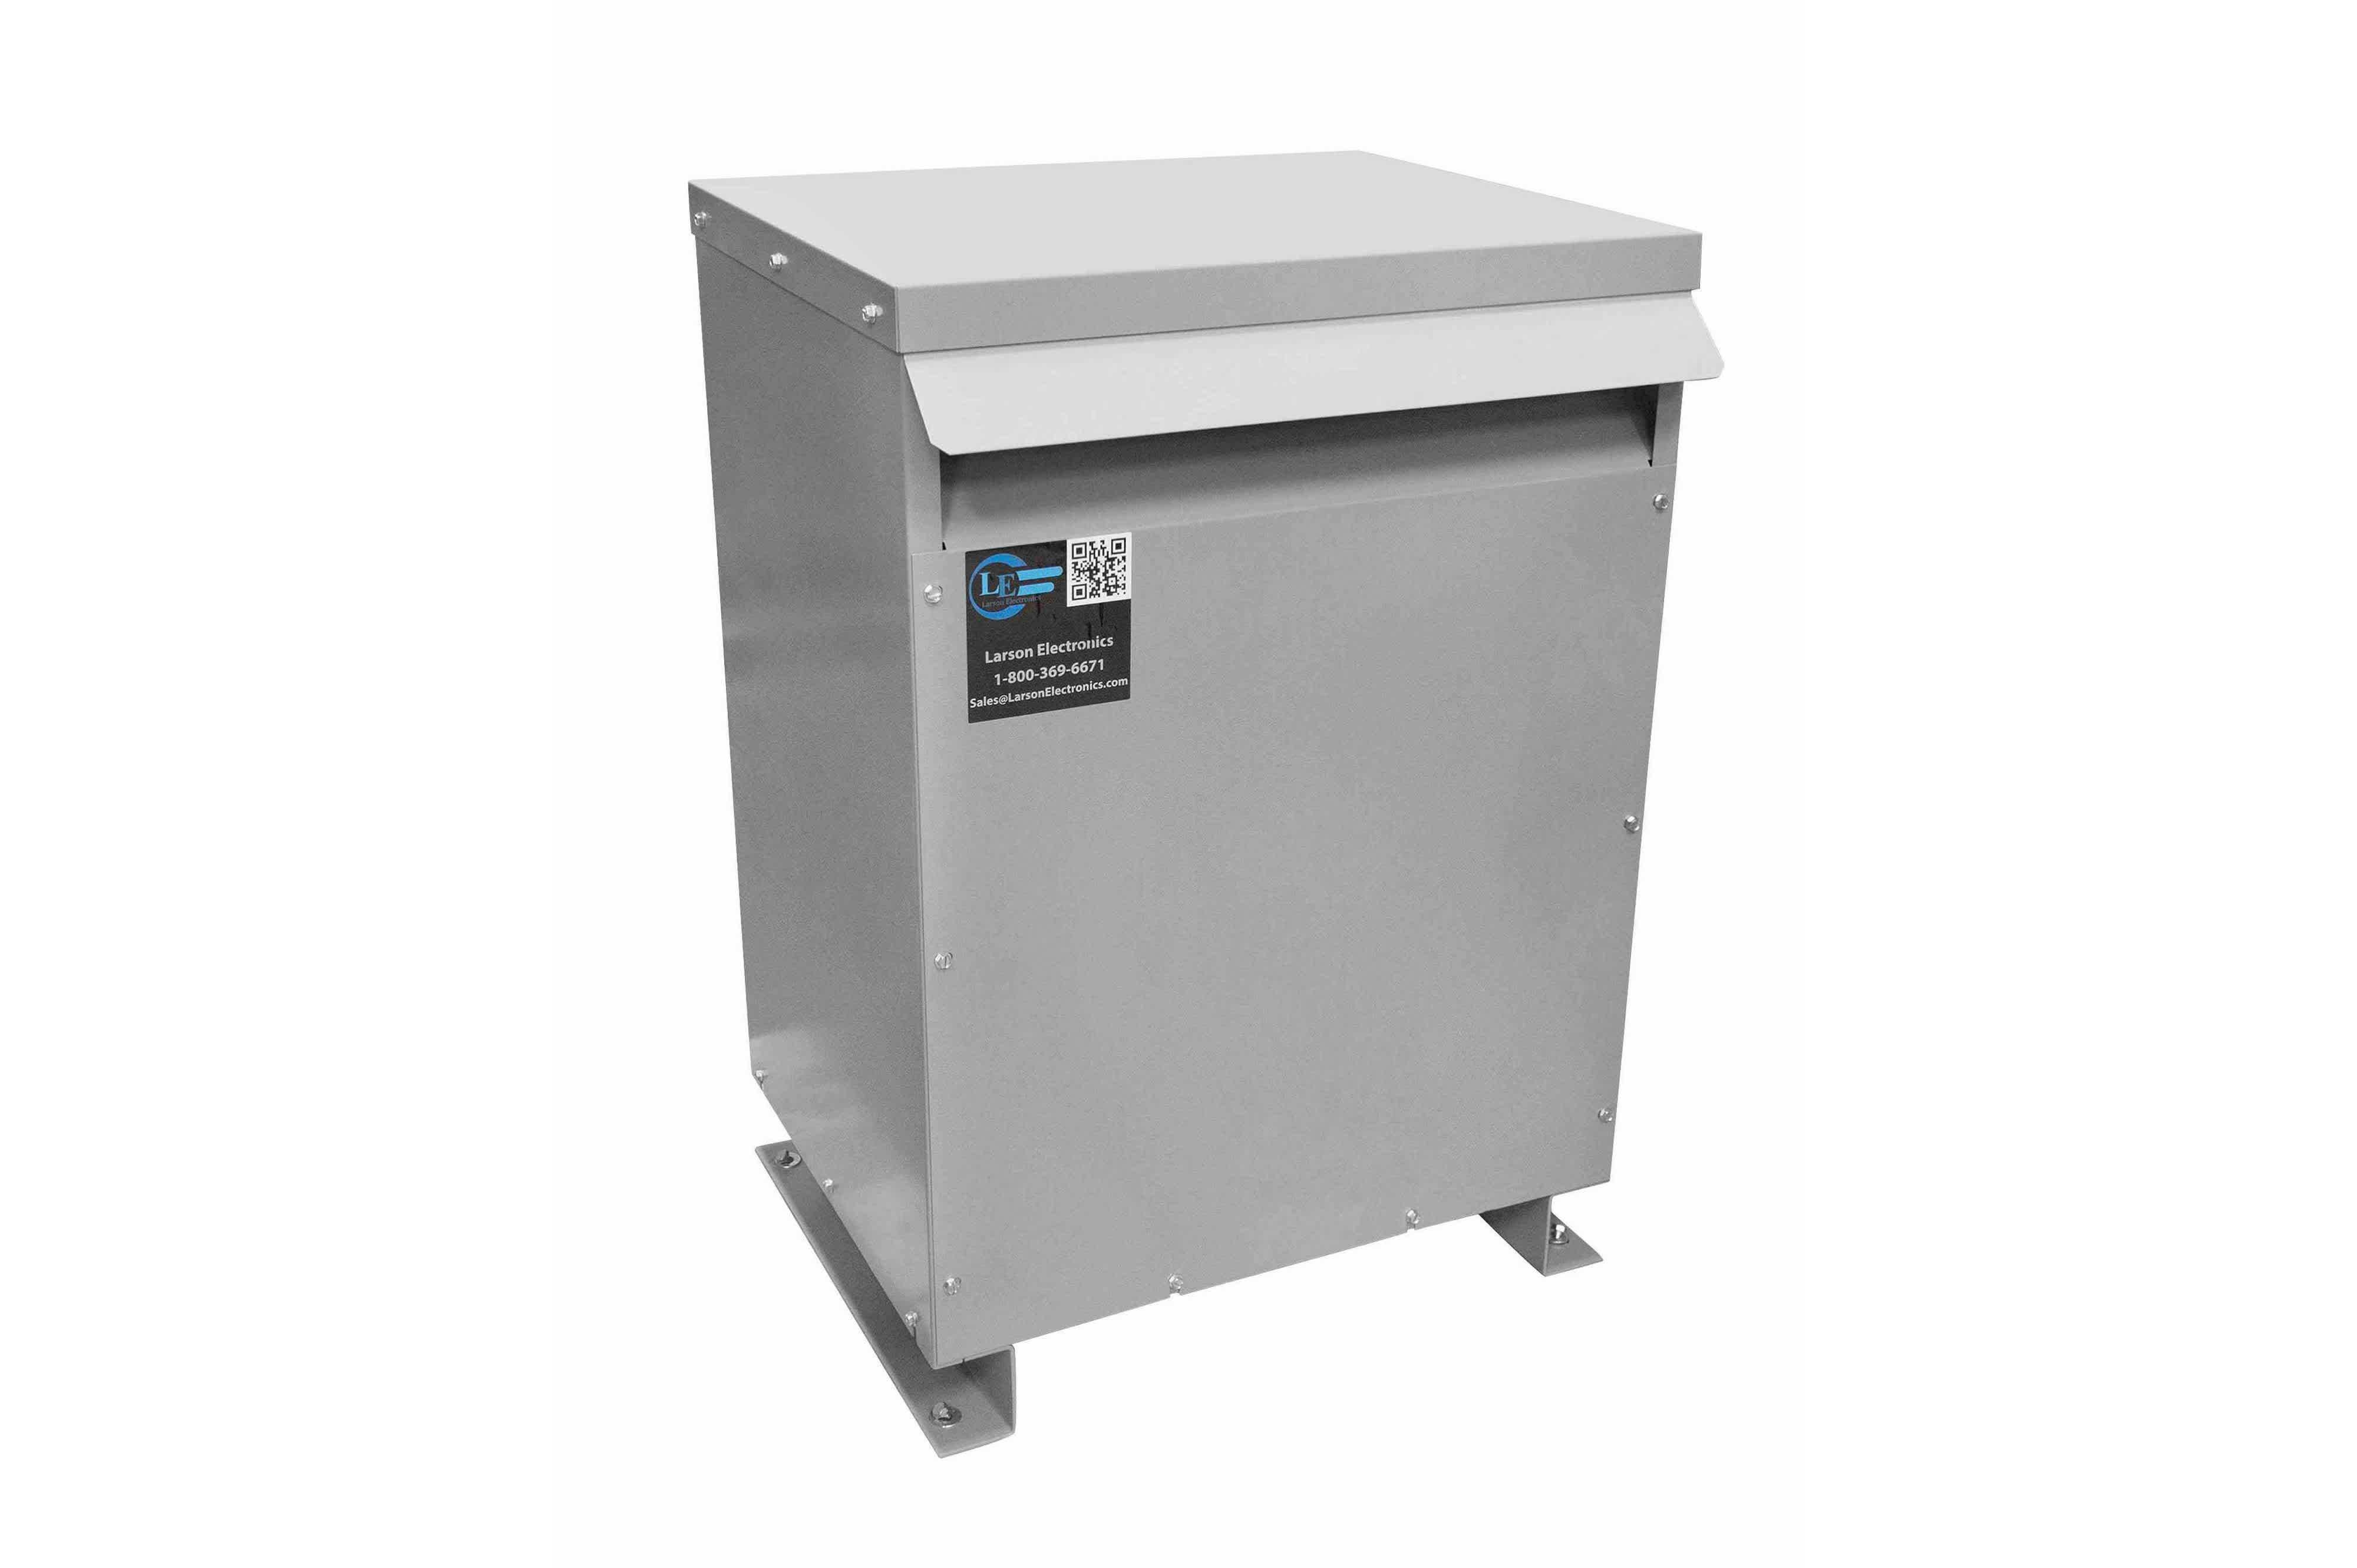 50 kVA 3PH Isolation Transformer, 480V Wye Primary, 380V Delta Secondary, N3R, Ventilated, 60 Hz